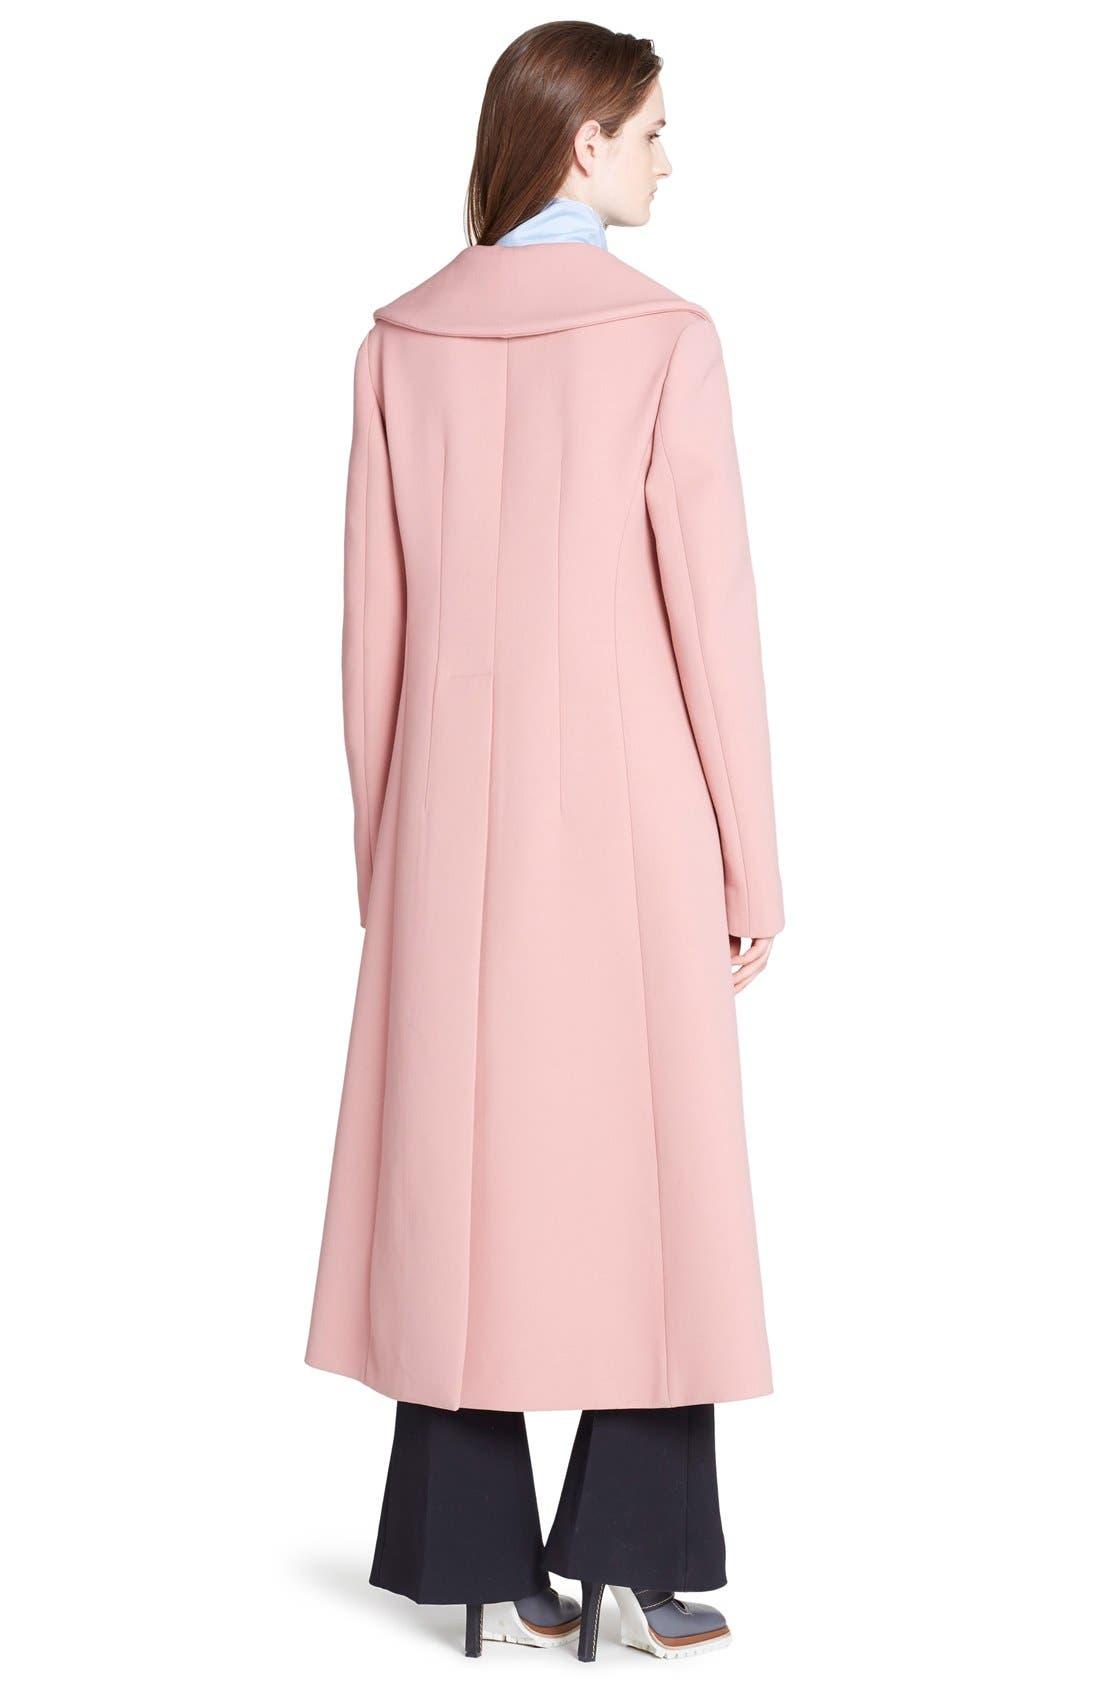 MARNI,                             Wide Lapel Wool Blend Coat,                             Alternate thumbnail 2, color,                             650